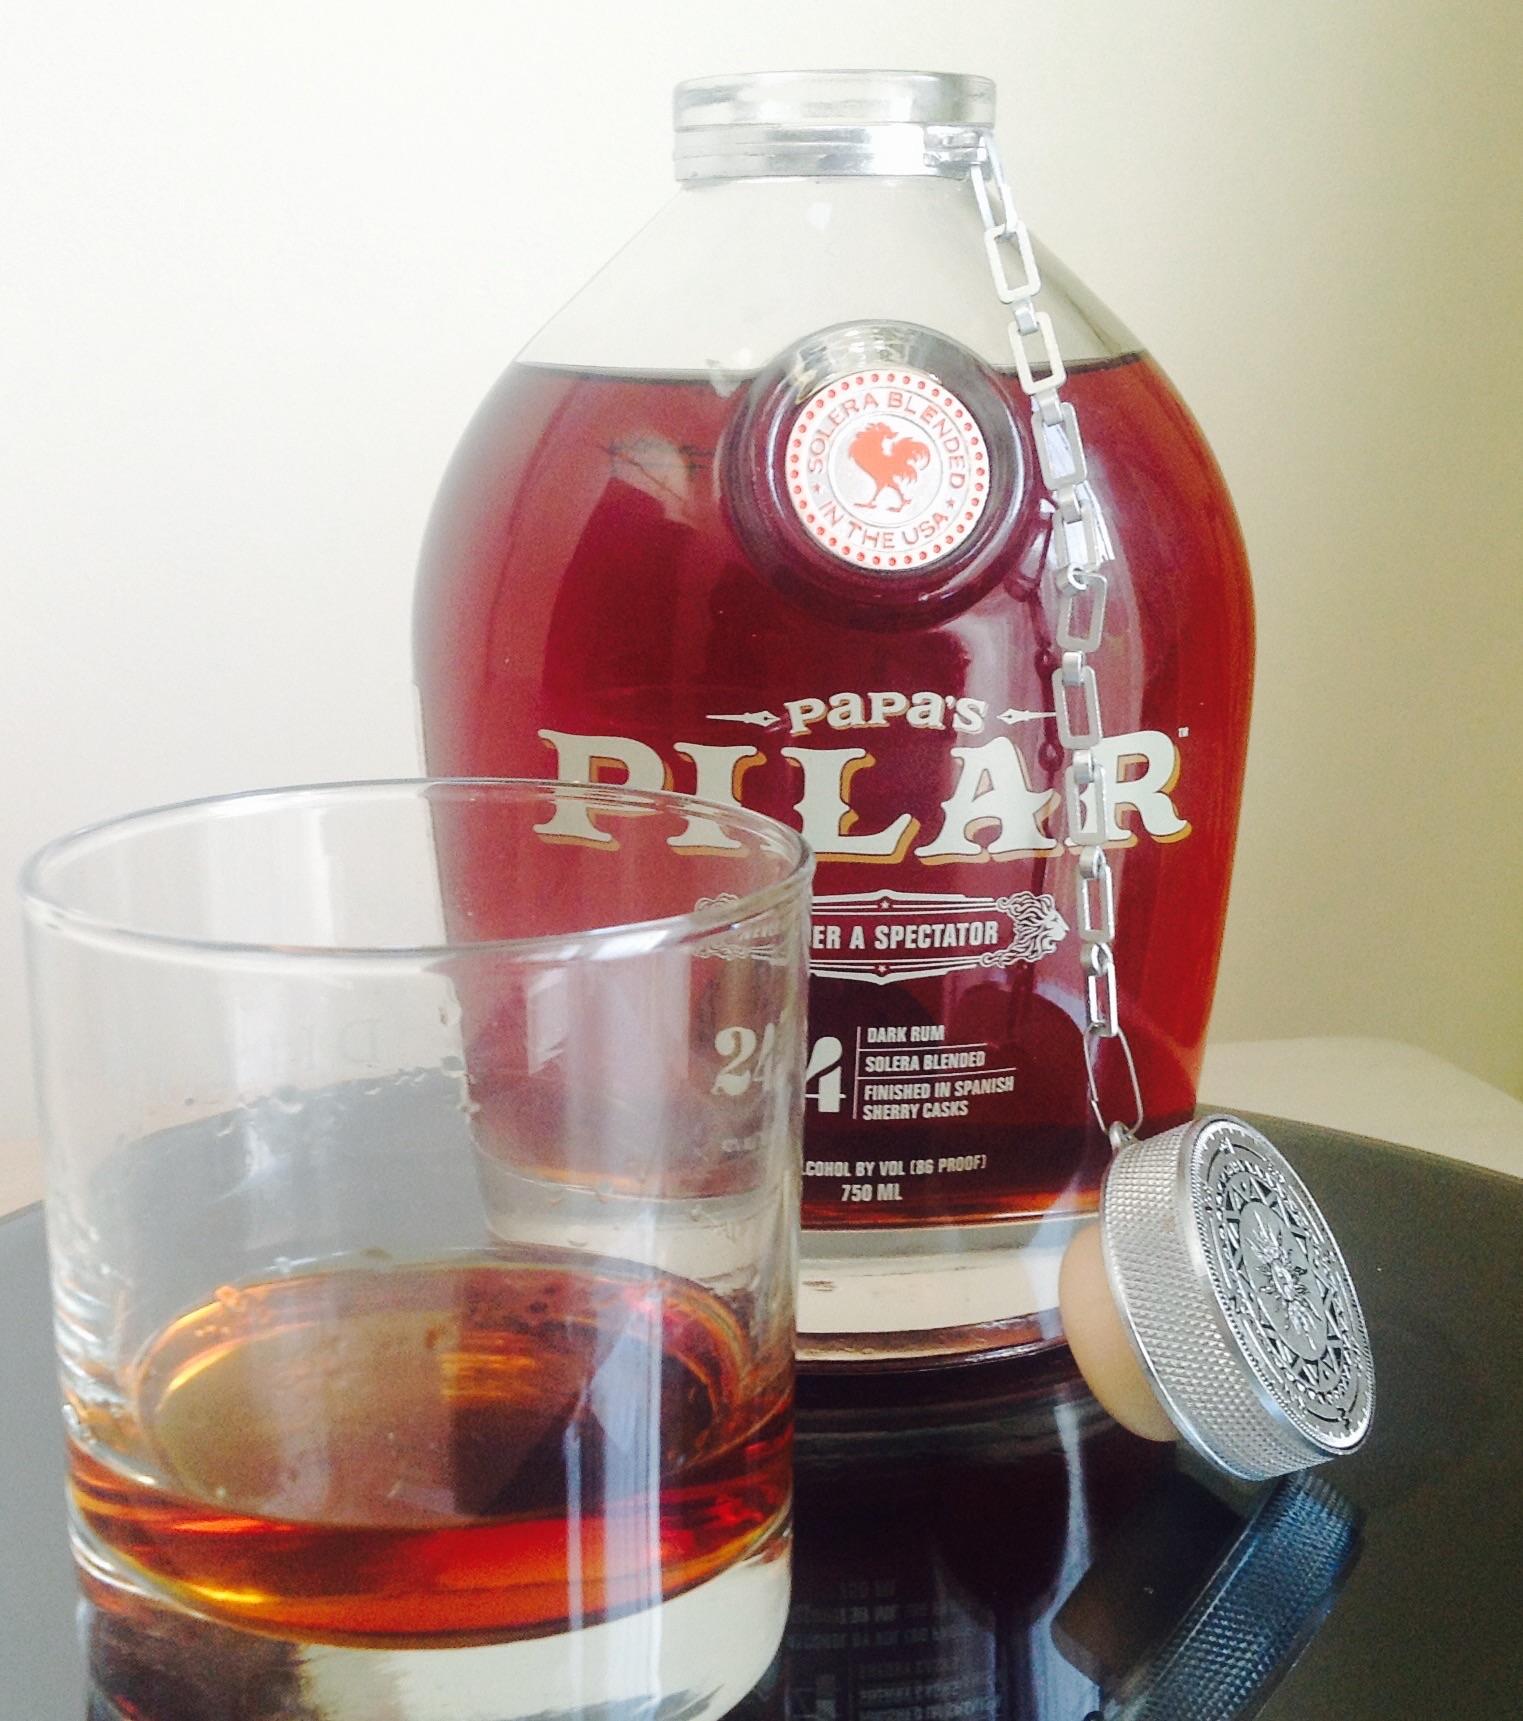 Papa's Pilar Blonde Rum - Drink of the Week | Busted Wallet